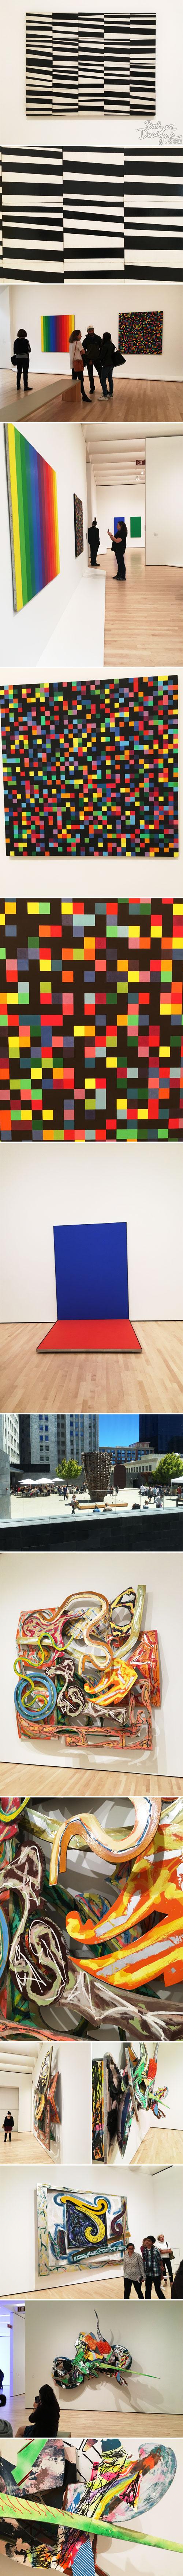 from the Balzer Designs Blog: San Francisco Museum of Modern Art #sfmoma